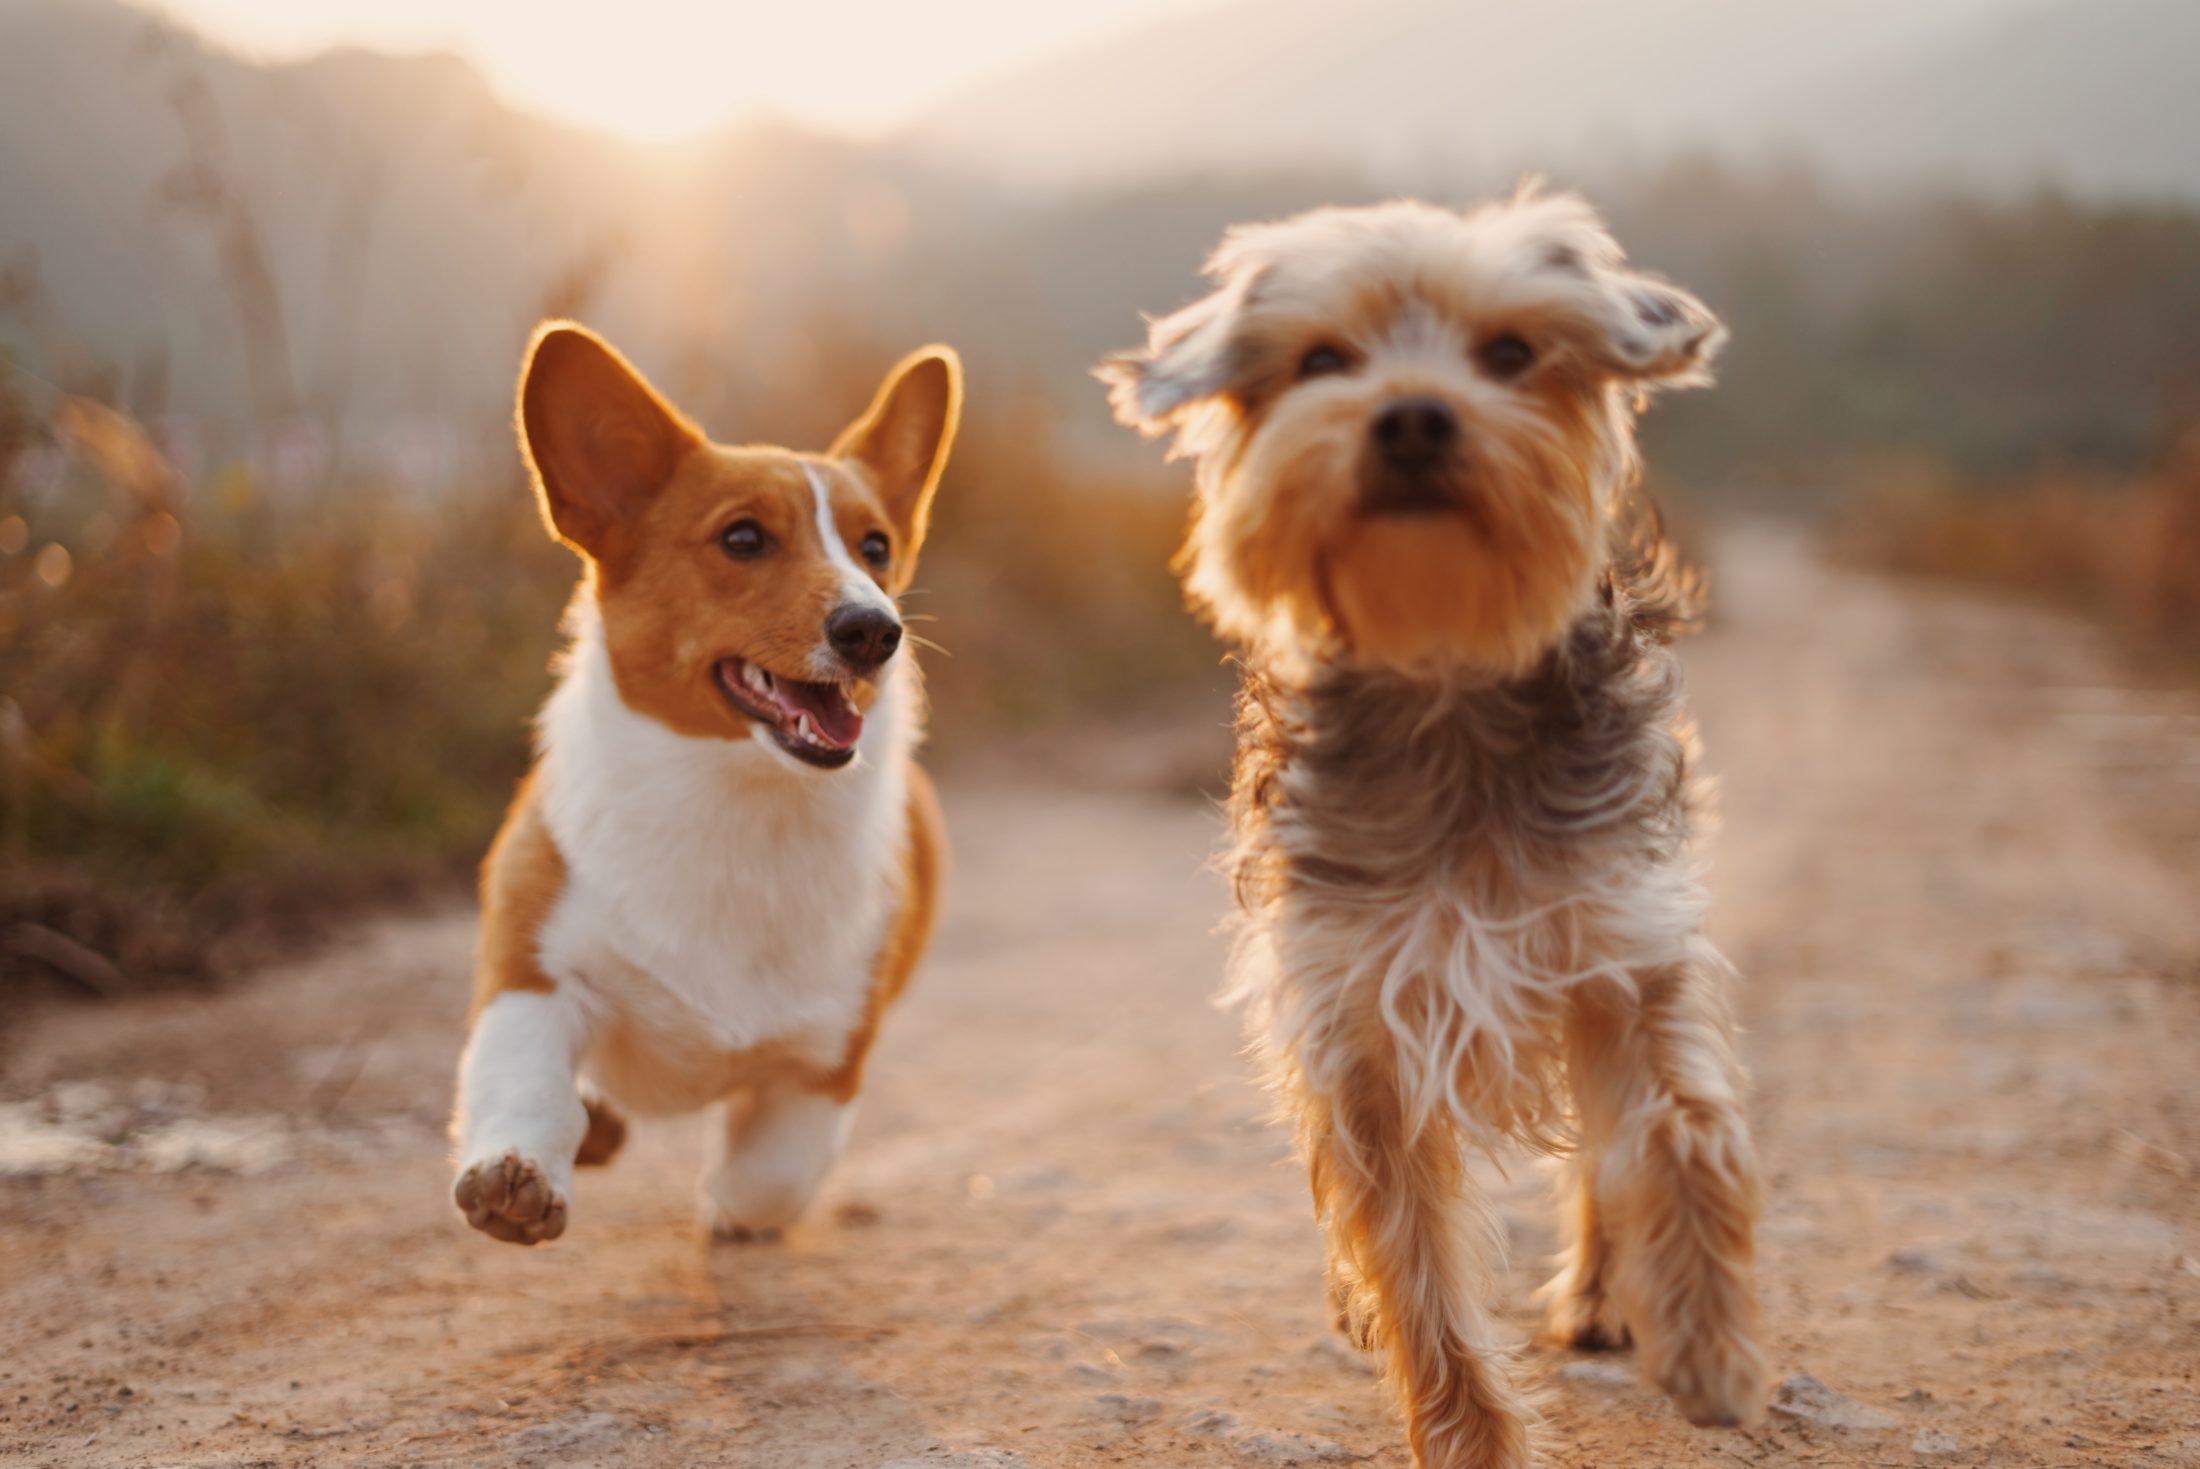 cachorros correndo soltos